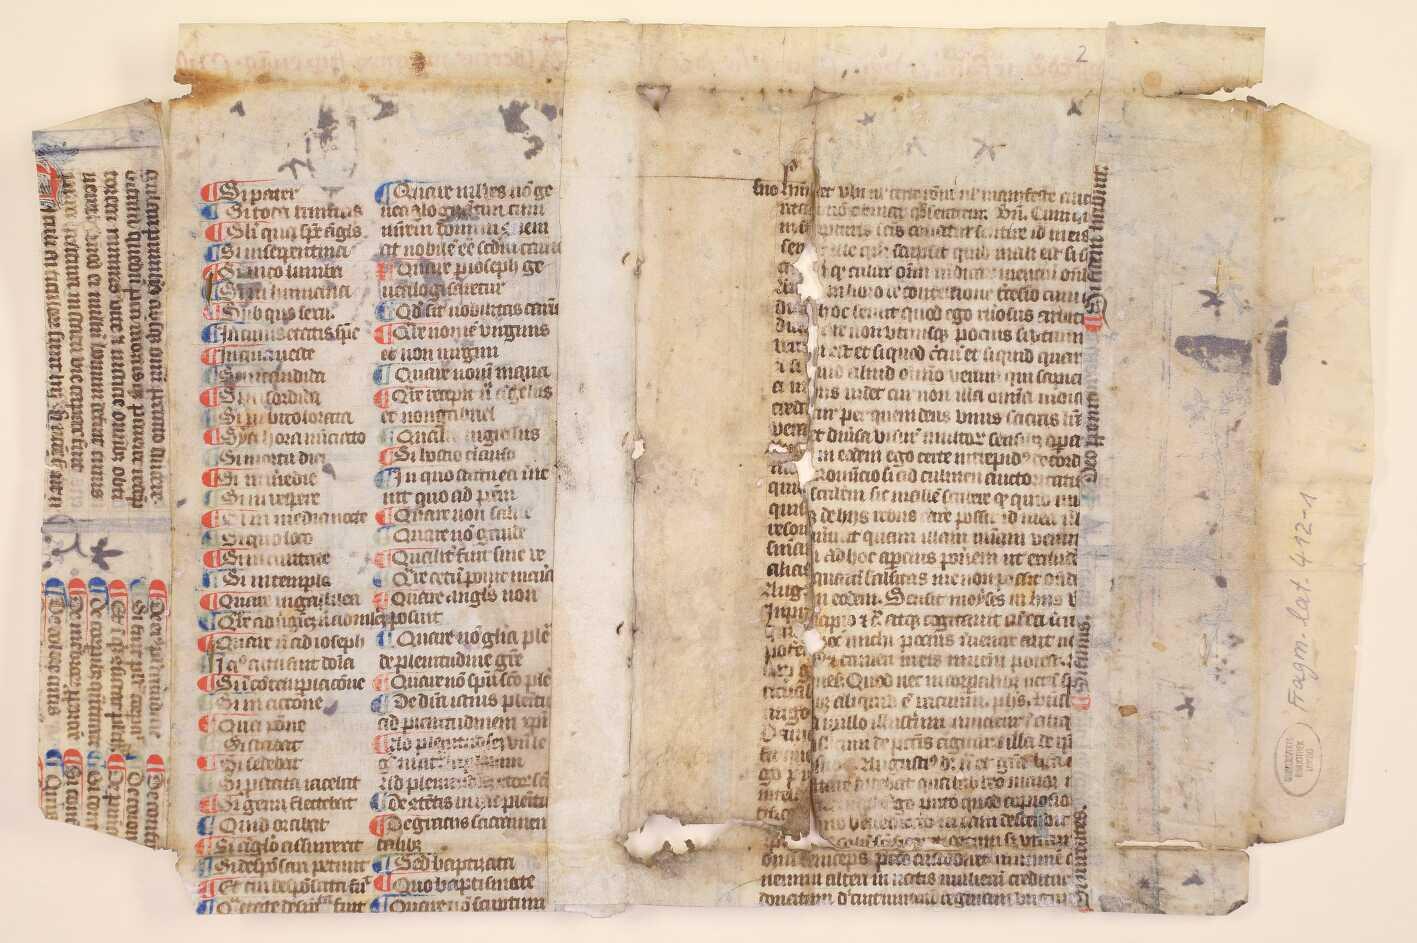 412-1: Rückseite des Fragments